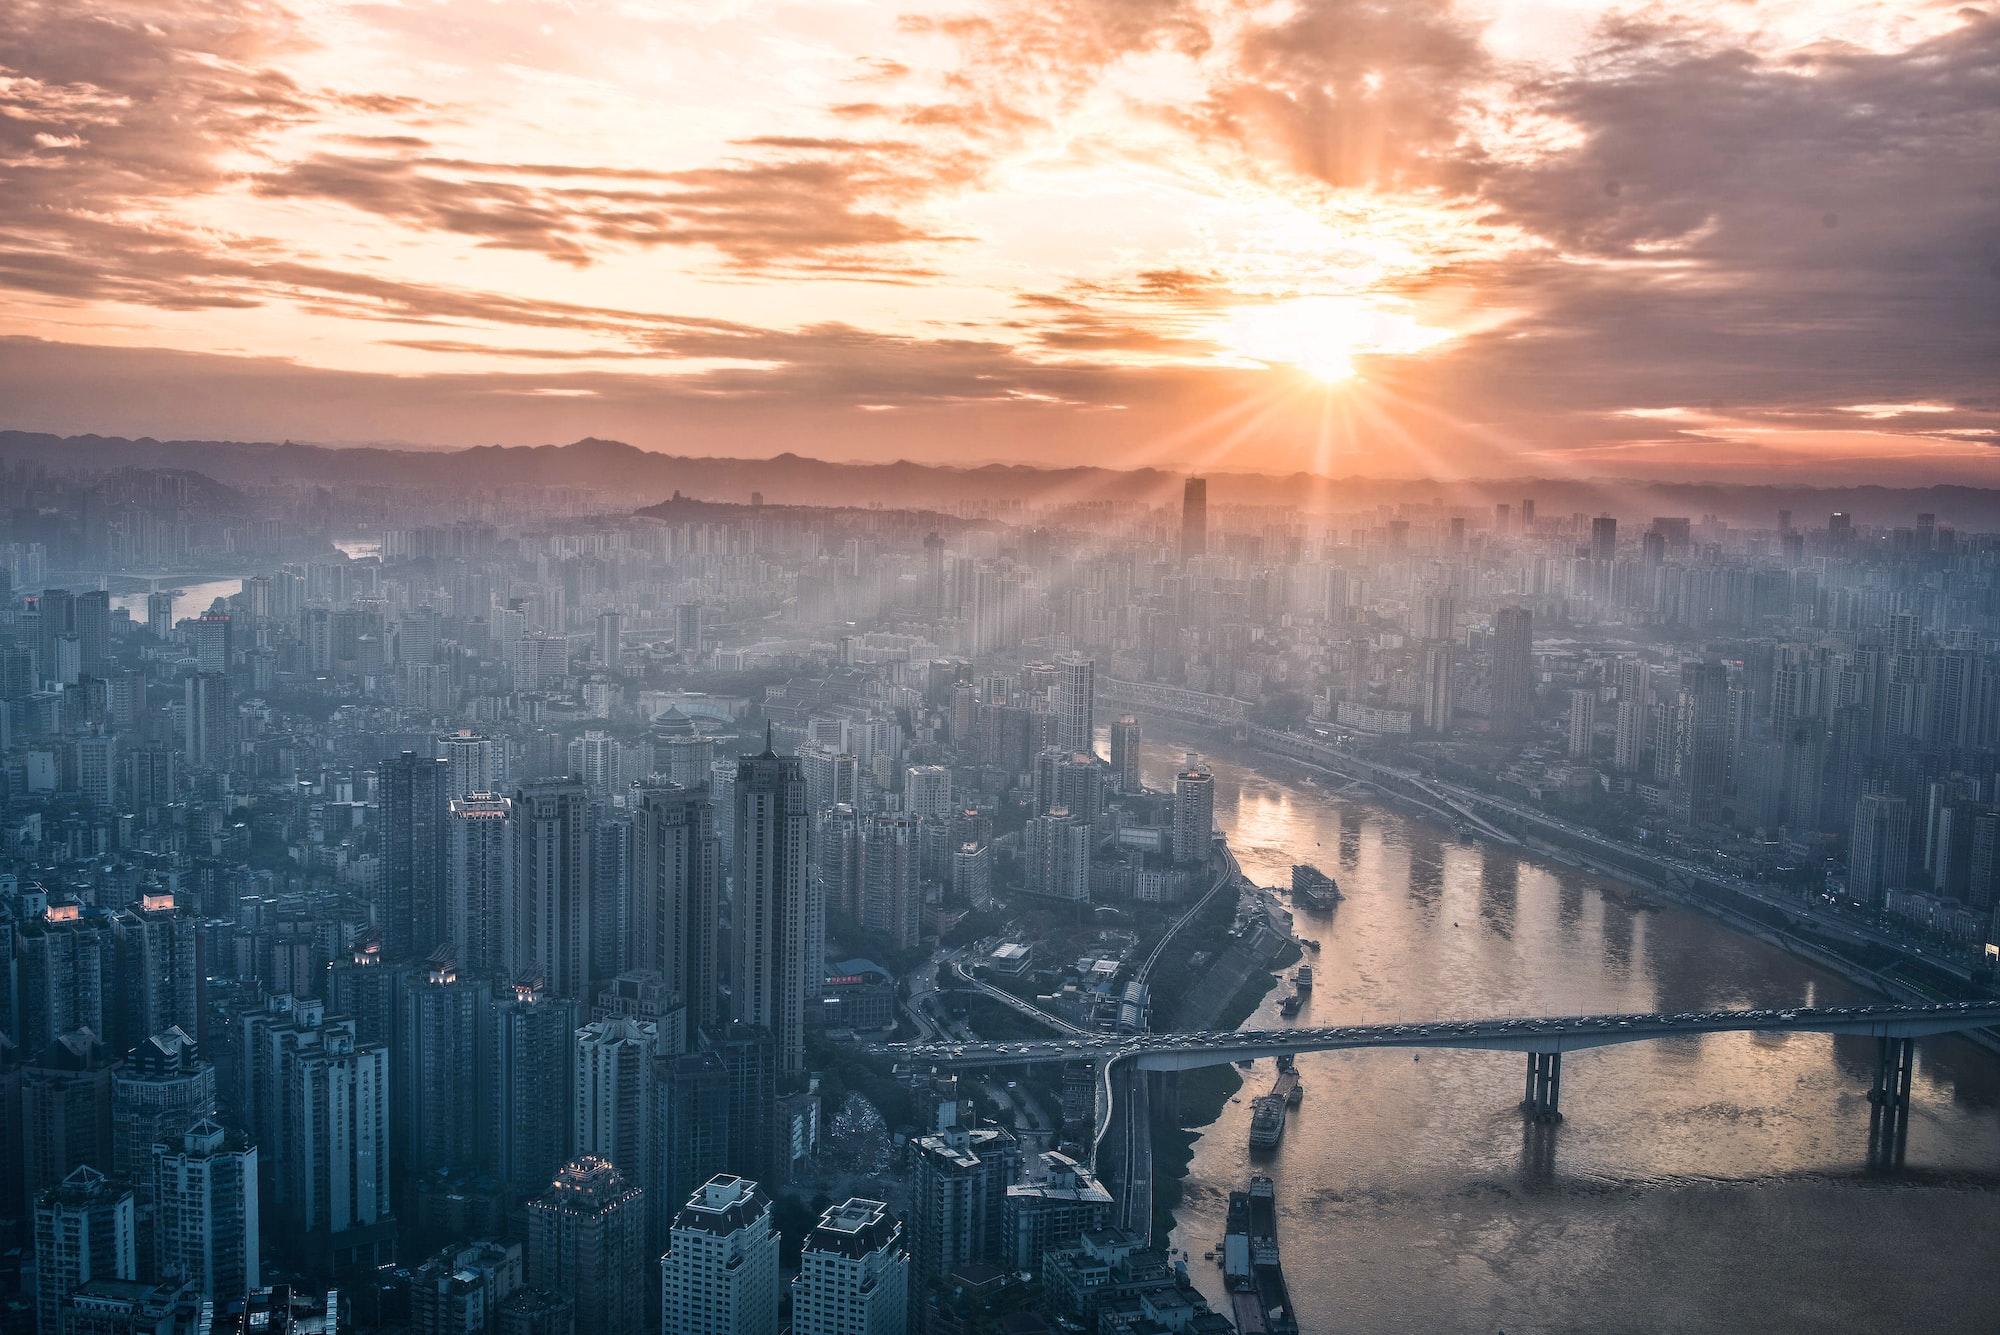 Urban Tech: The underdog of the innovation world